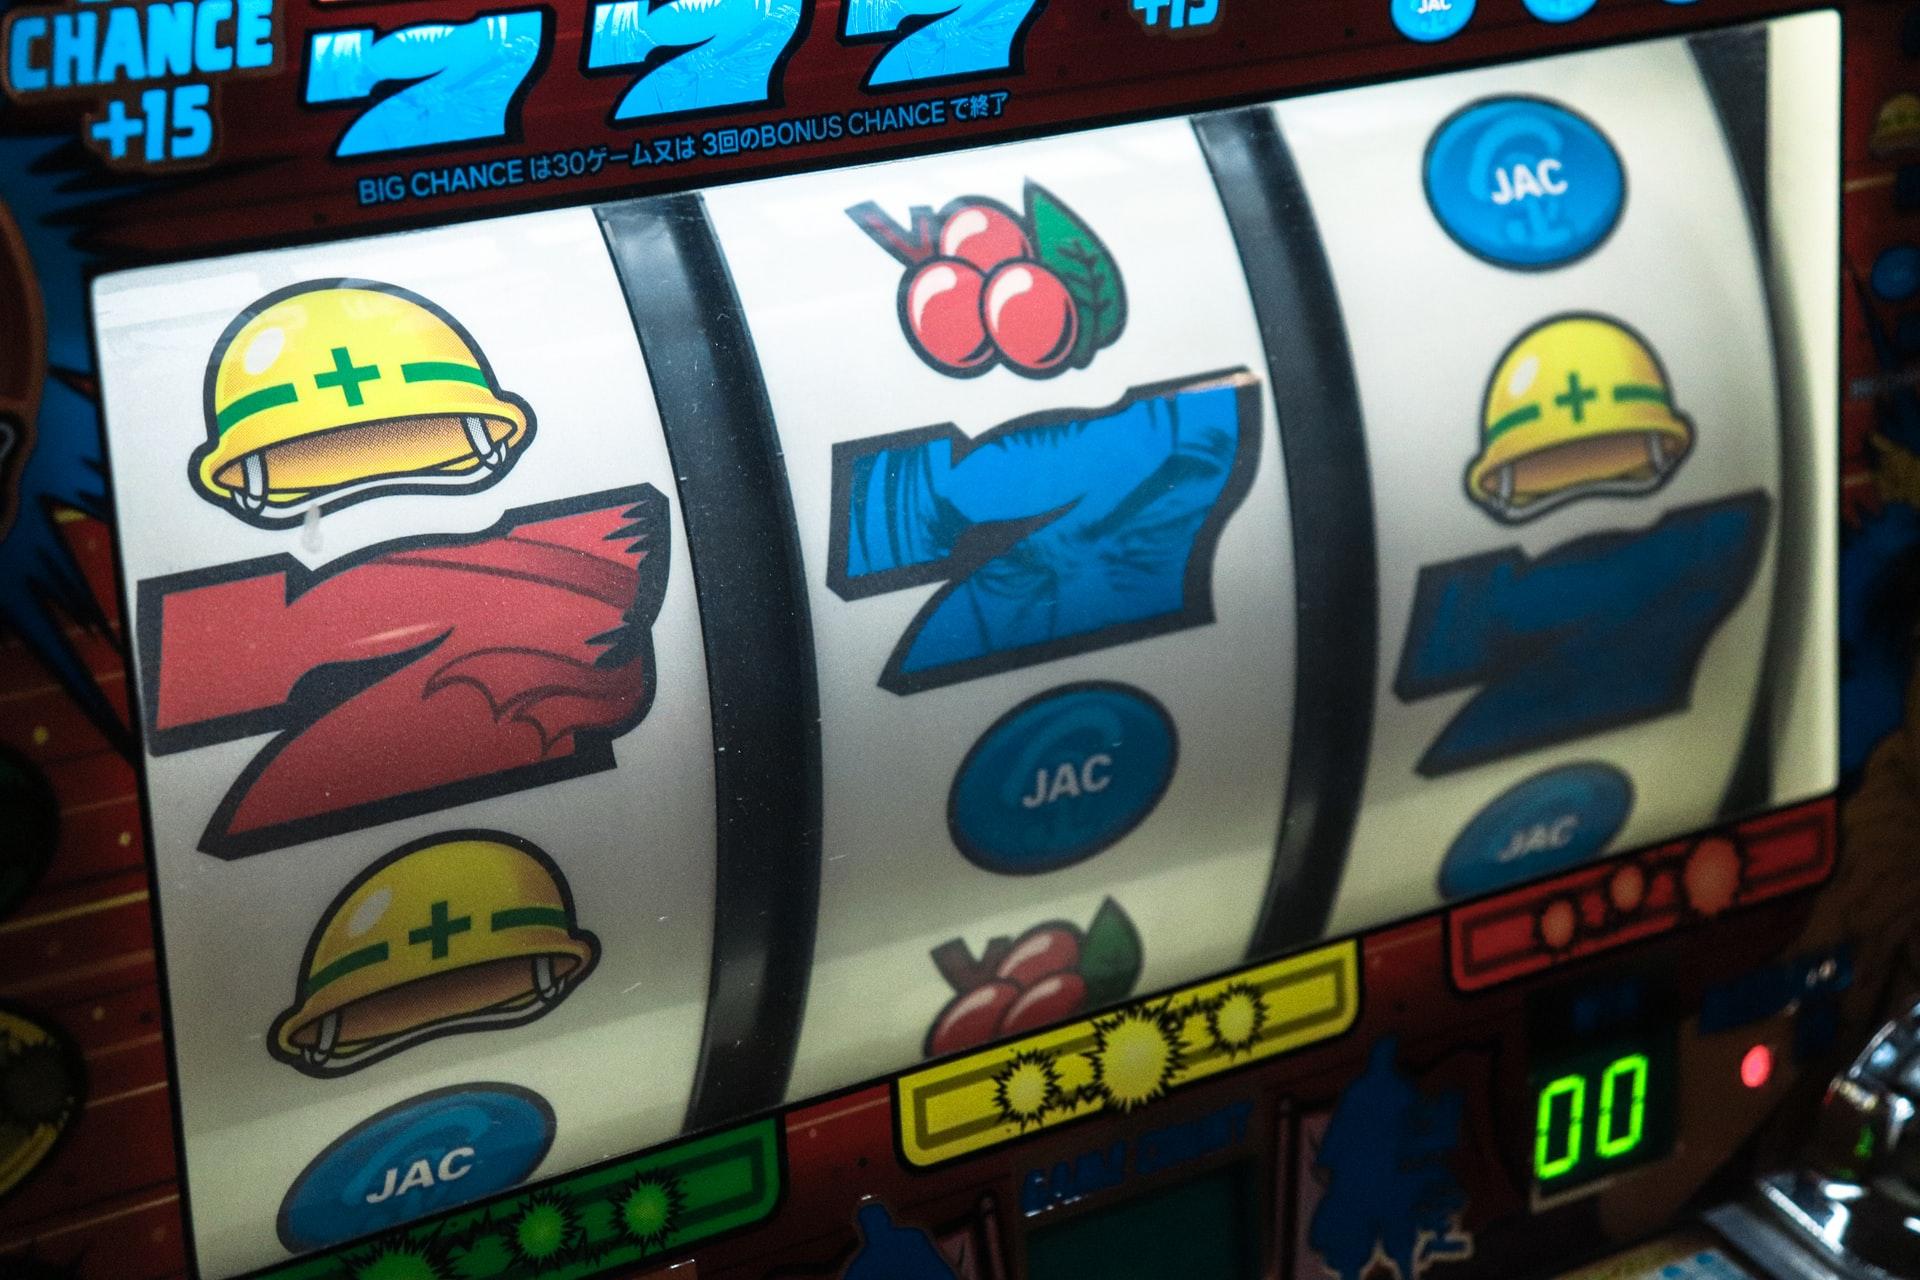 France's Q1 2020 Online Gambling Figures Up